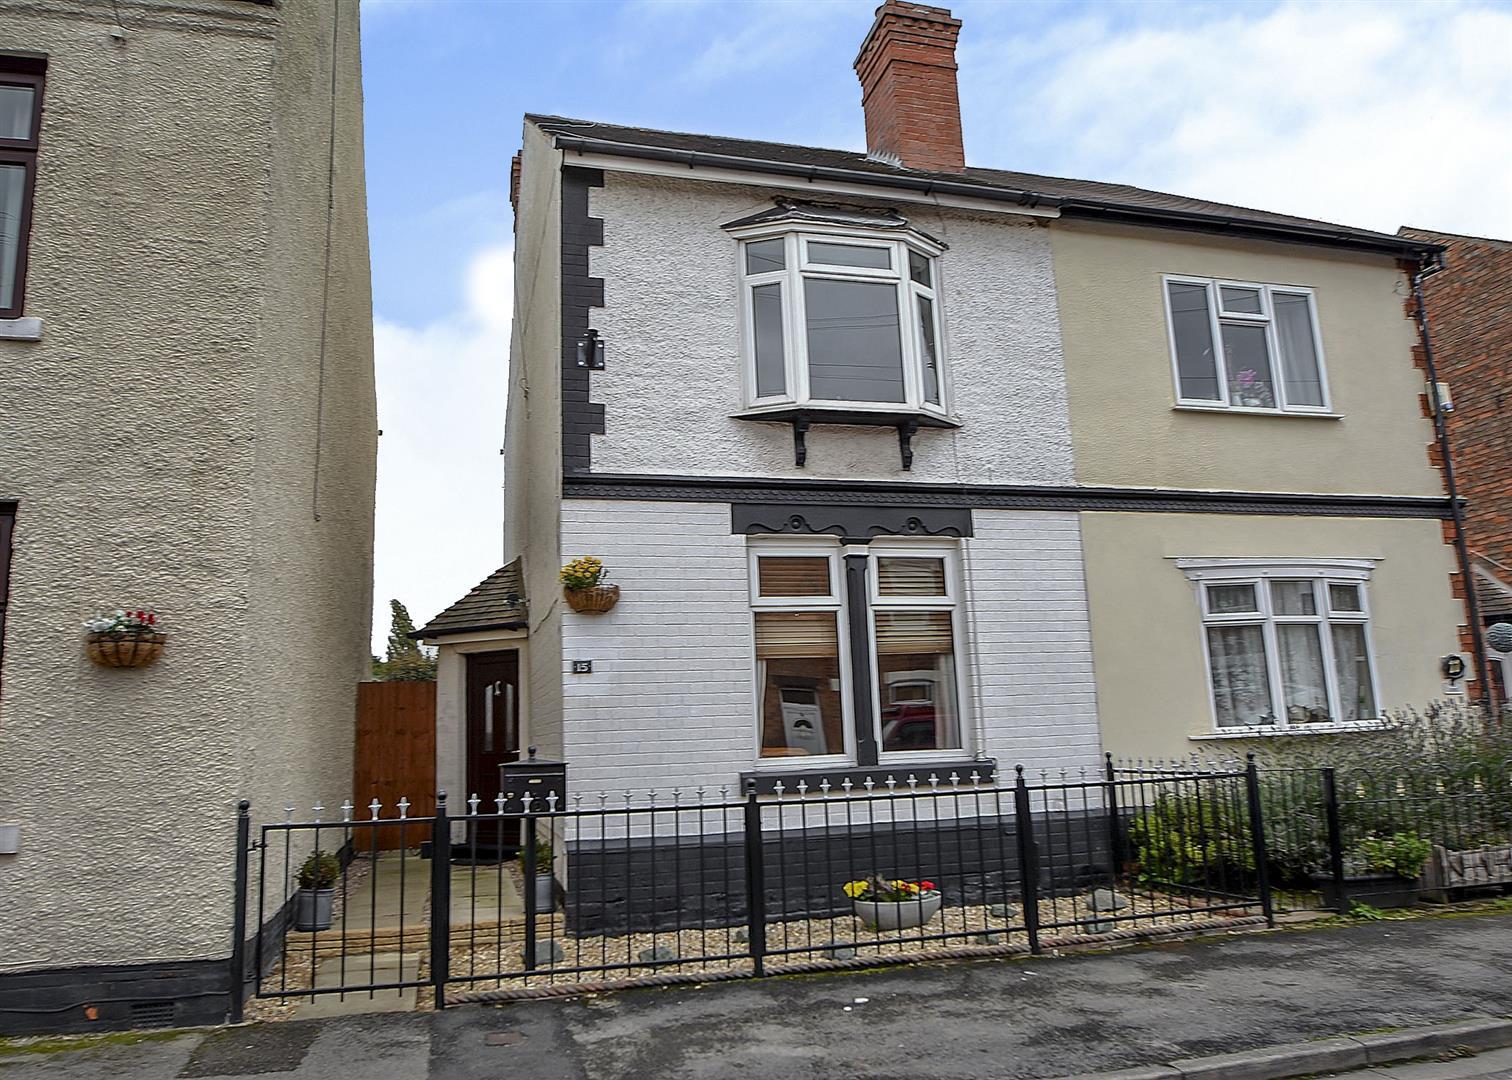 2 Bedrooms Semi Detached House for sale in Harrington Street, Draycott